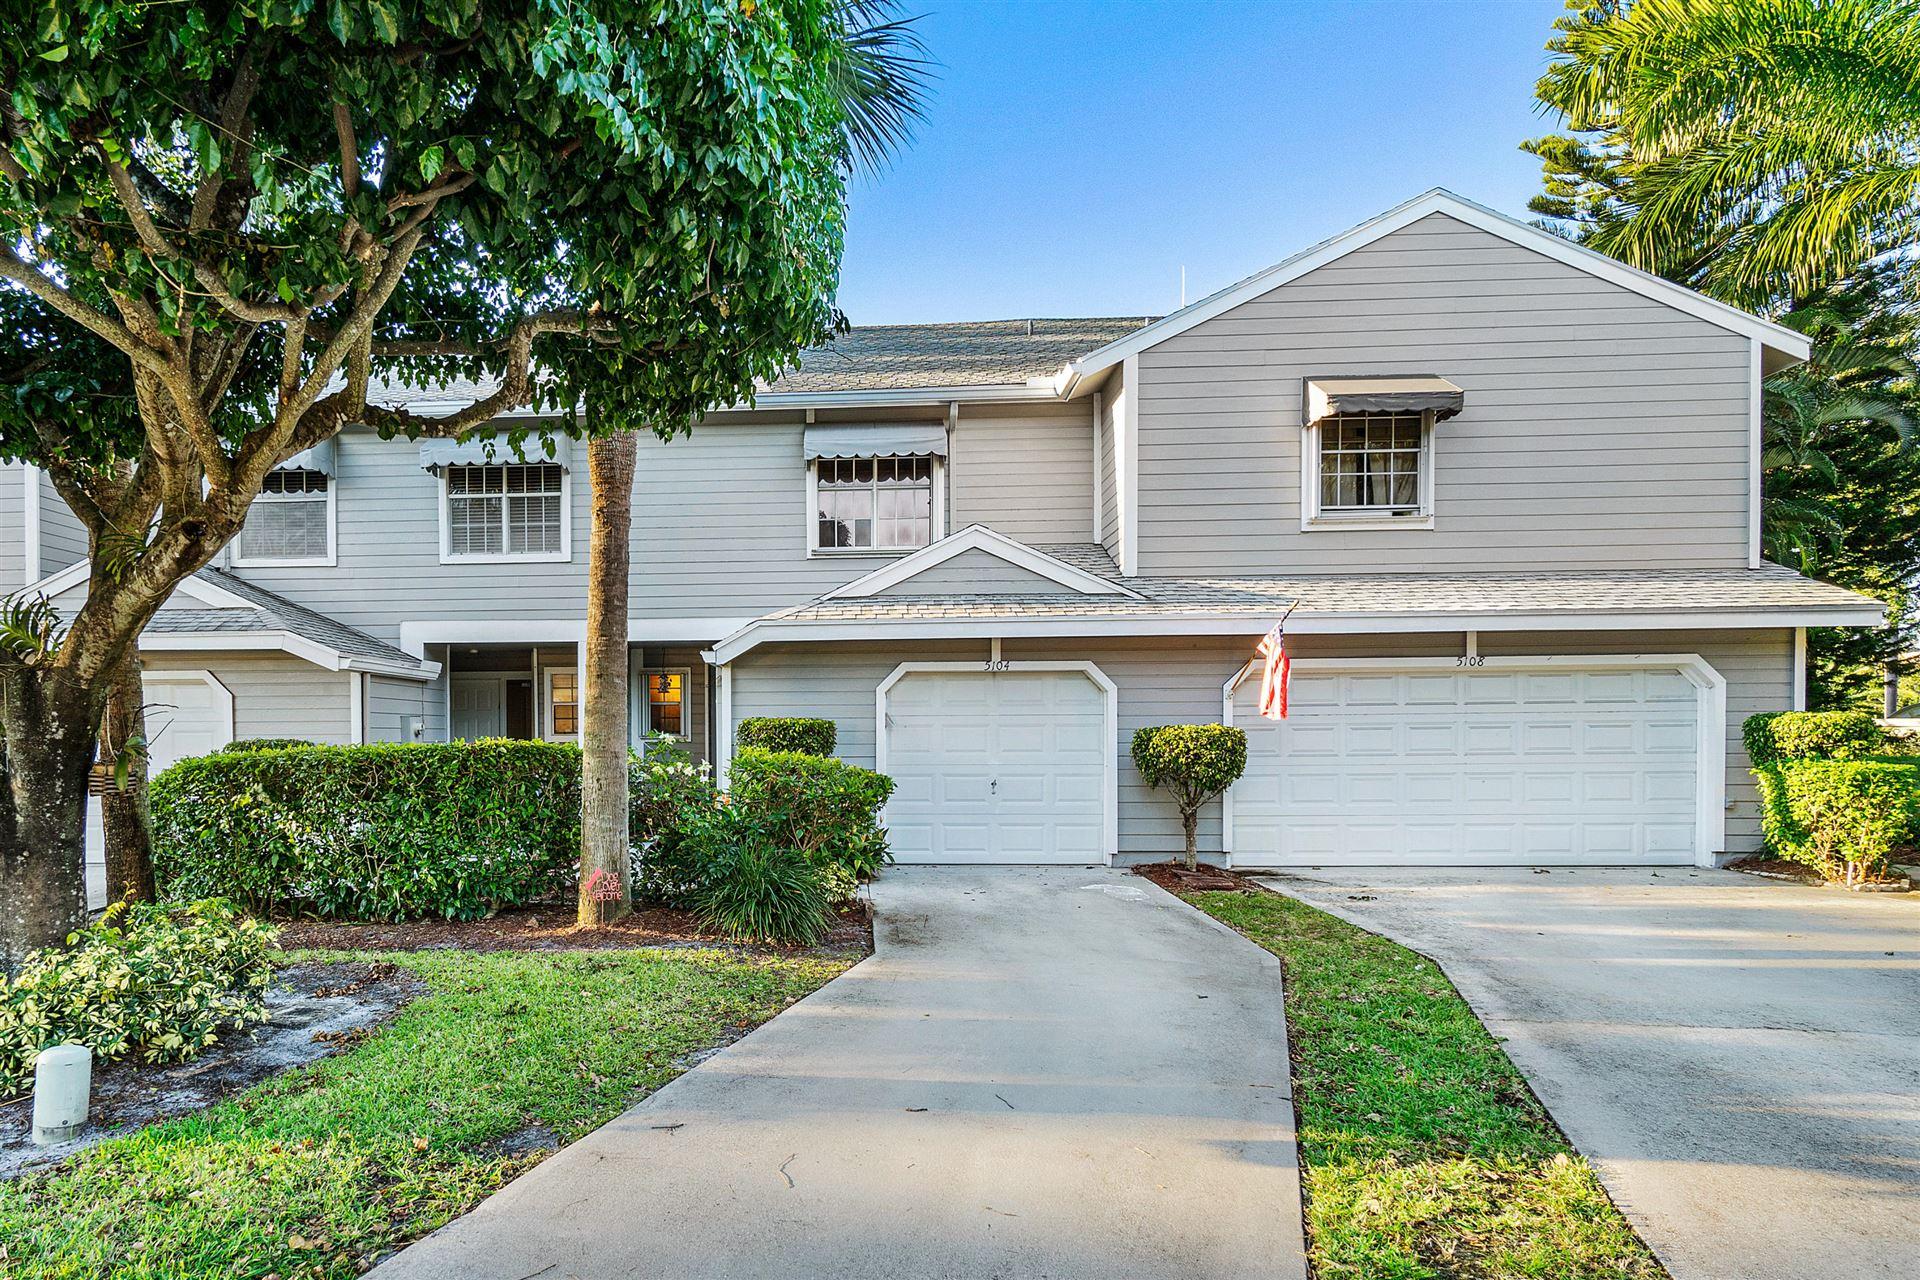 5104 Pointe Emerald Lane, Boca Raton, FL 33486 - #: RX-10675922